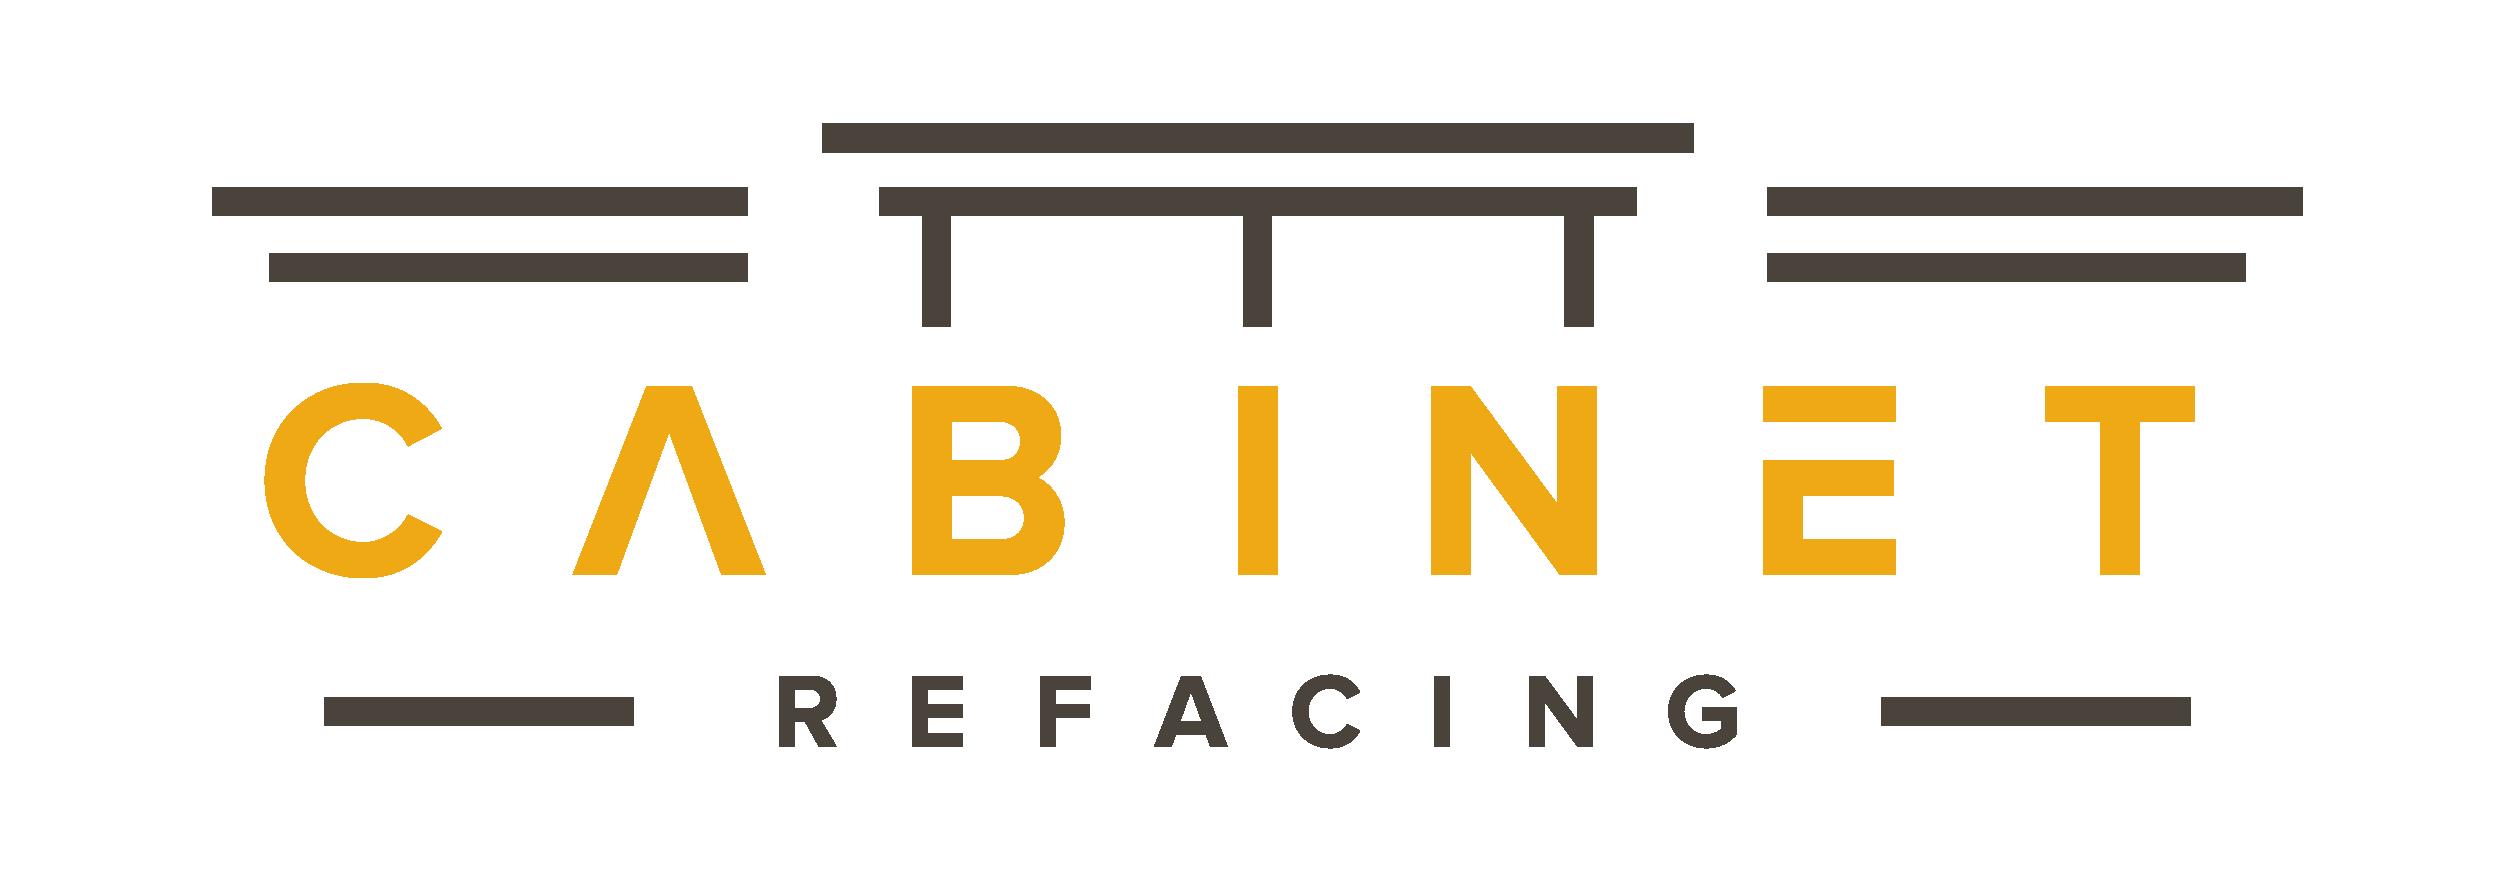 Cabinet Refacing Trends